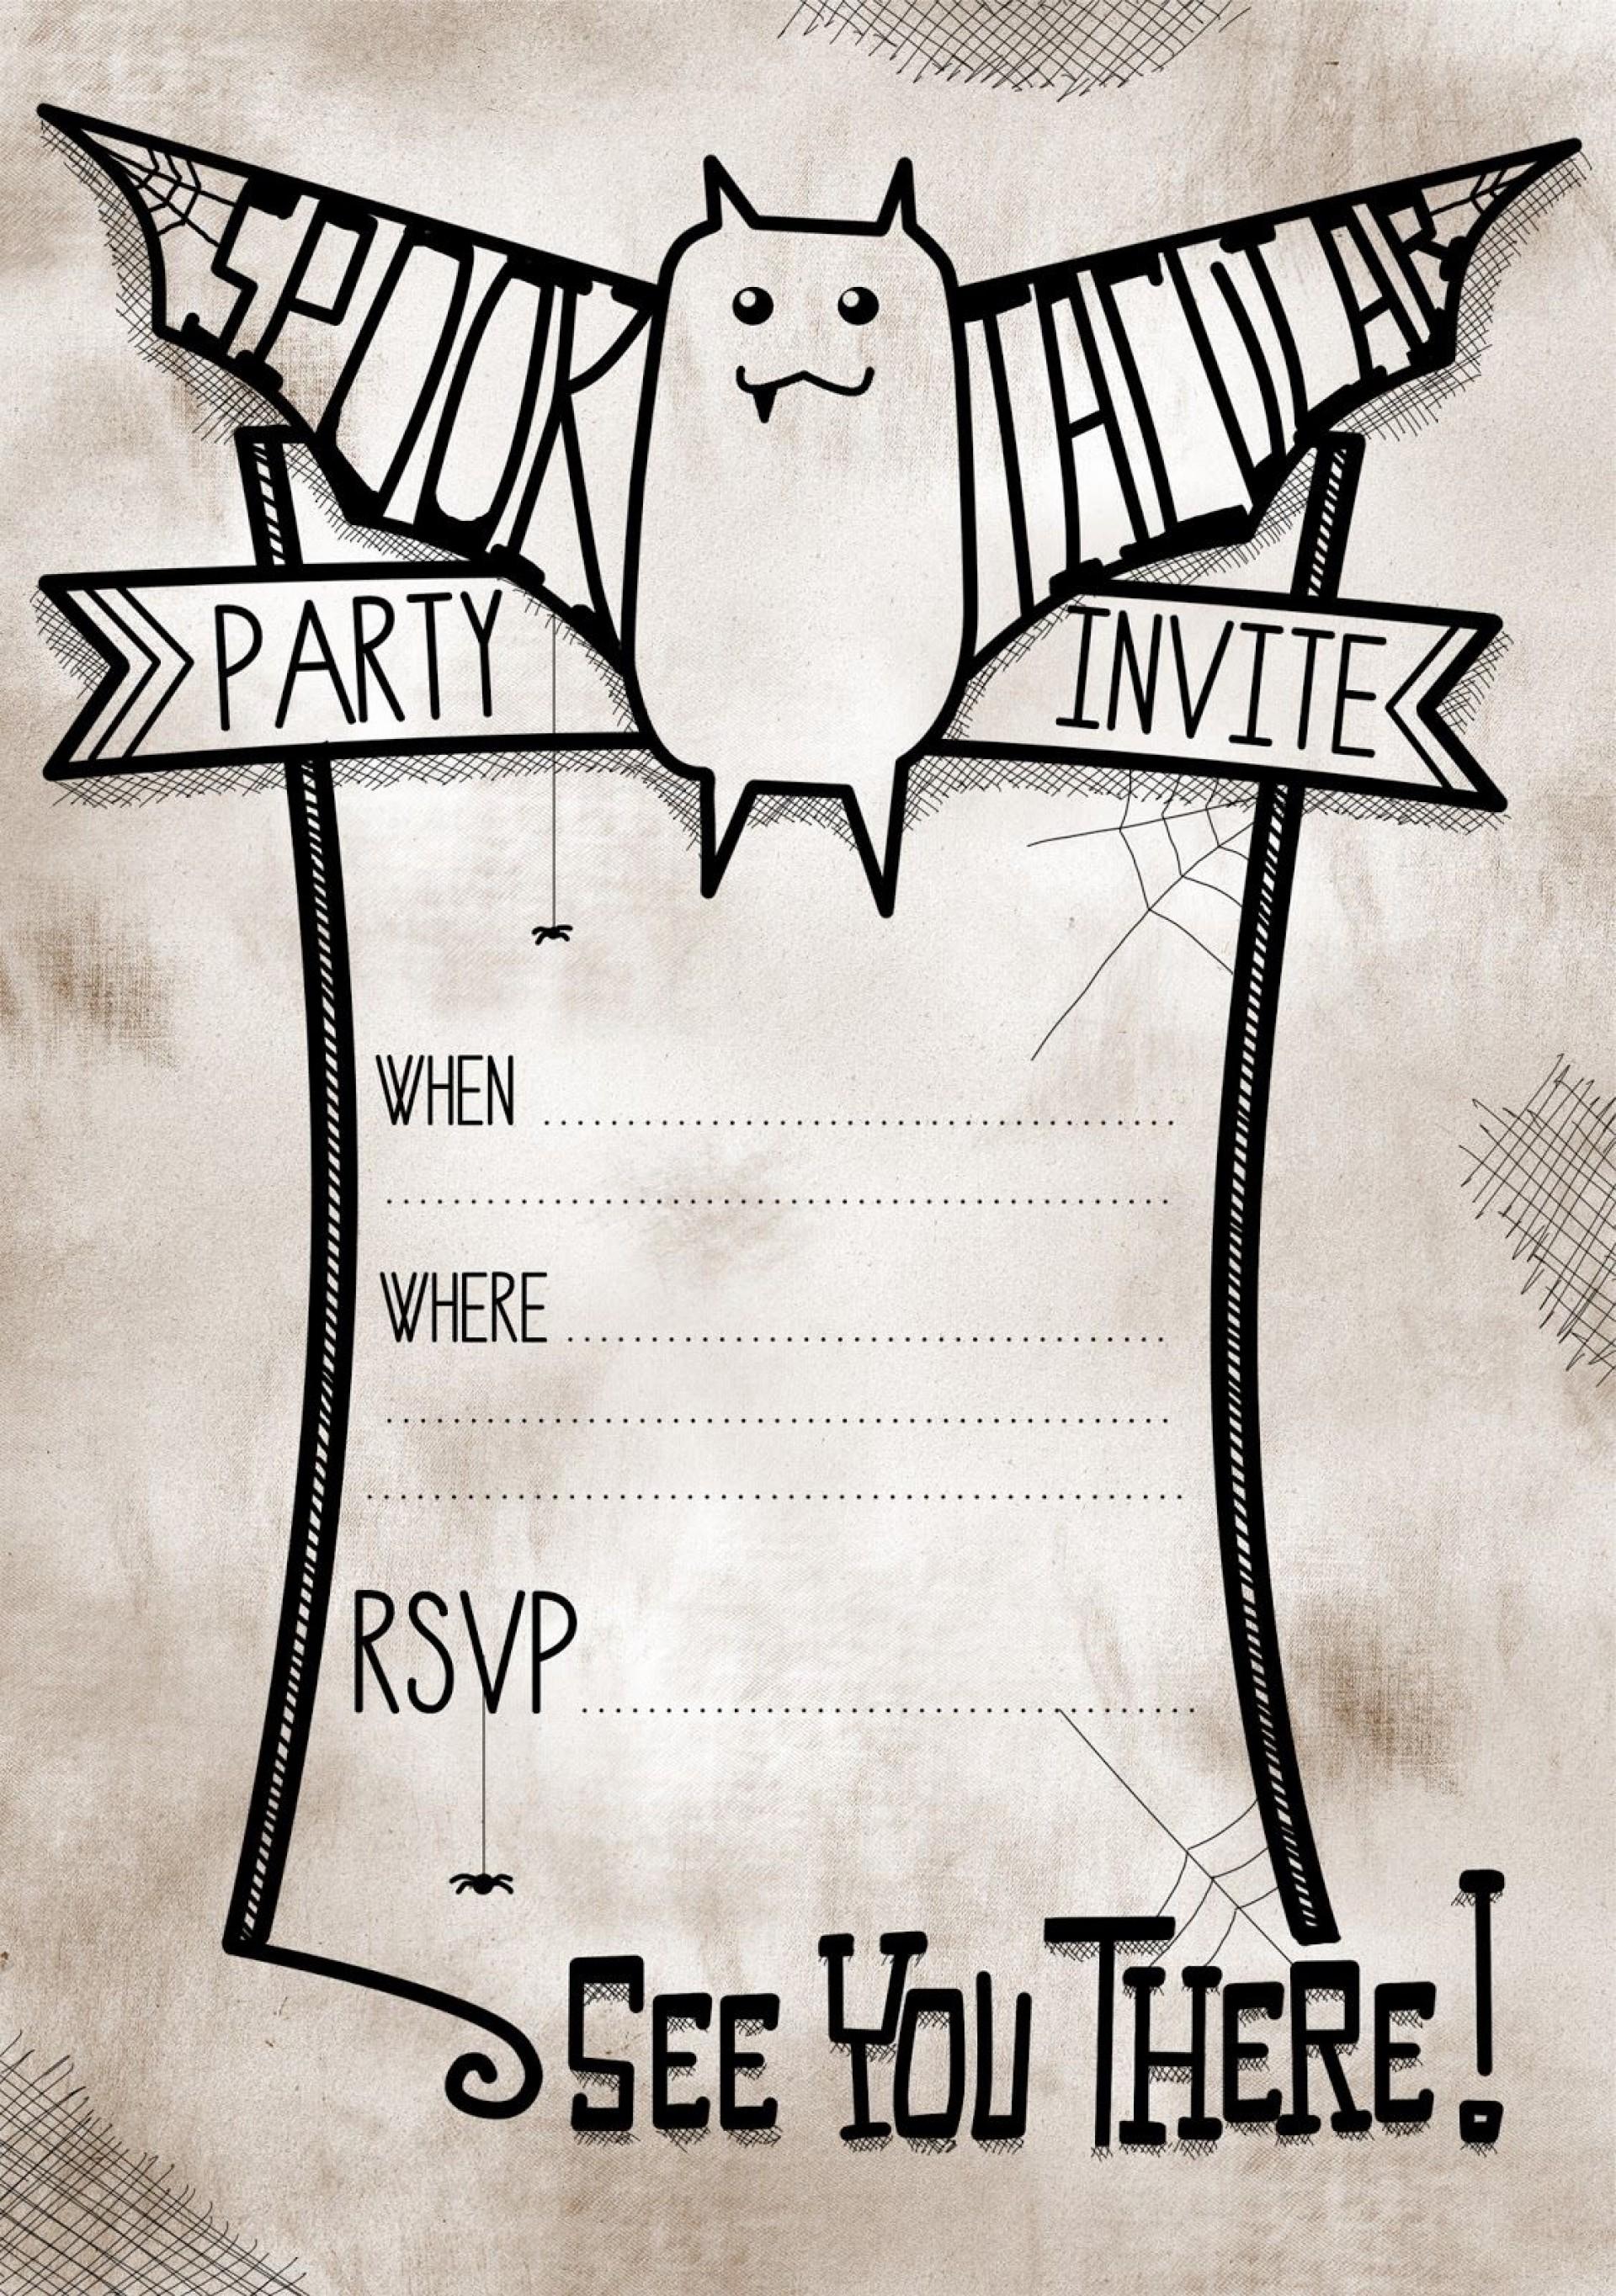 006 Impressive Free Halloween Invite Template Idea  Templates Party Invitation For Word1920